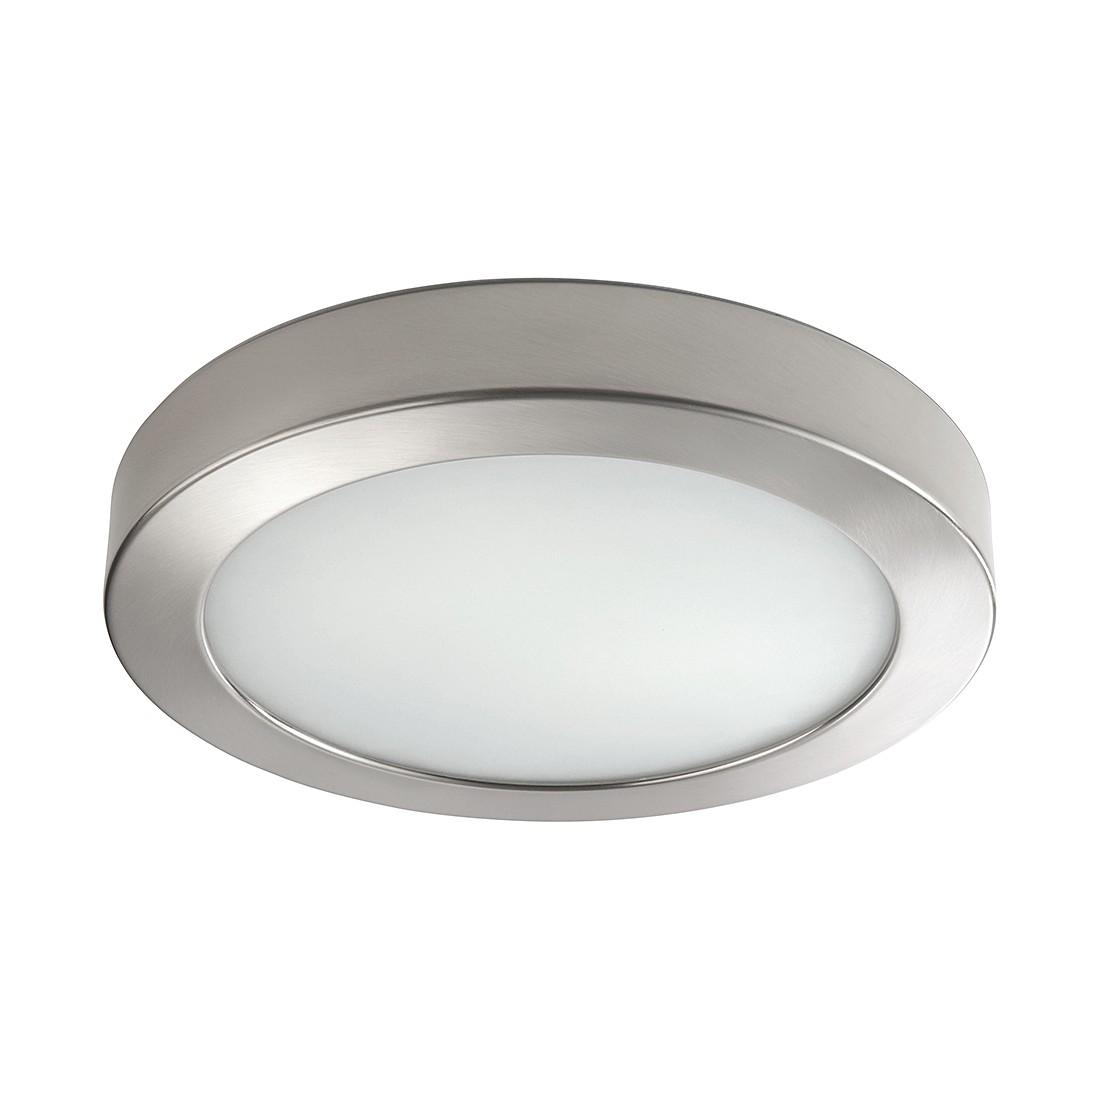 EEK A+, Deckenleuchte myLiving – Metal – 1-flammig, Philips Ledino bestellen